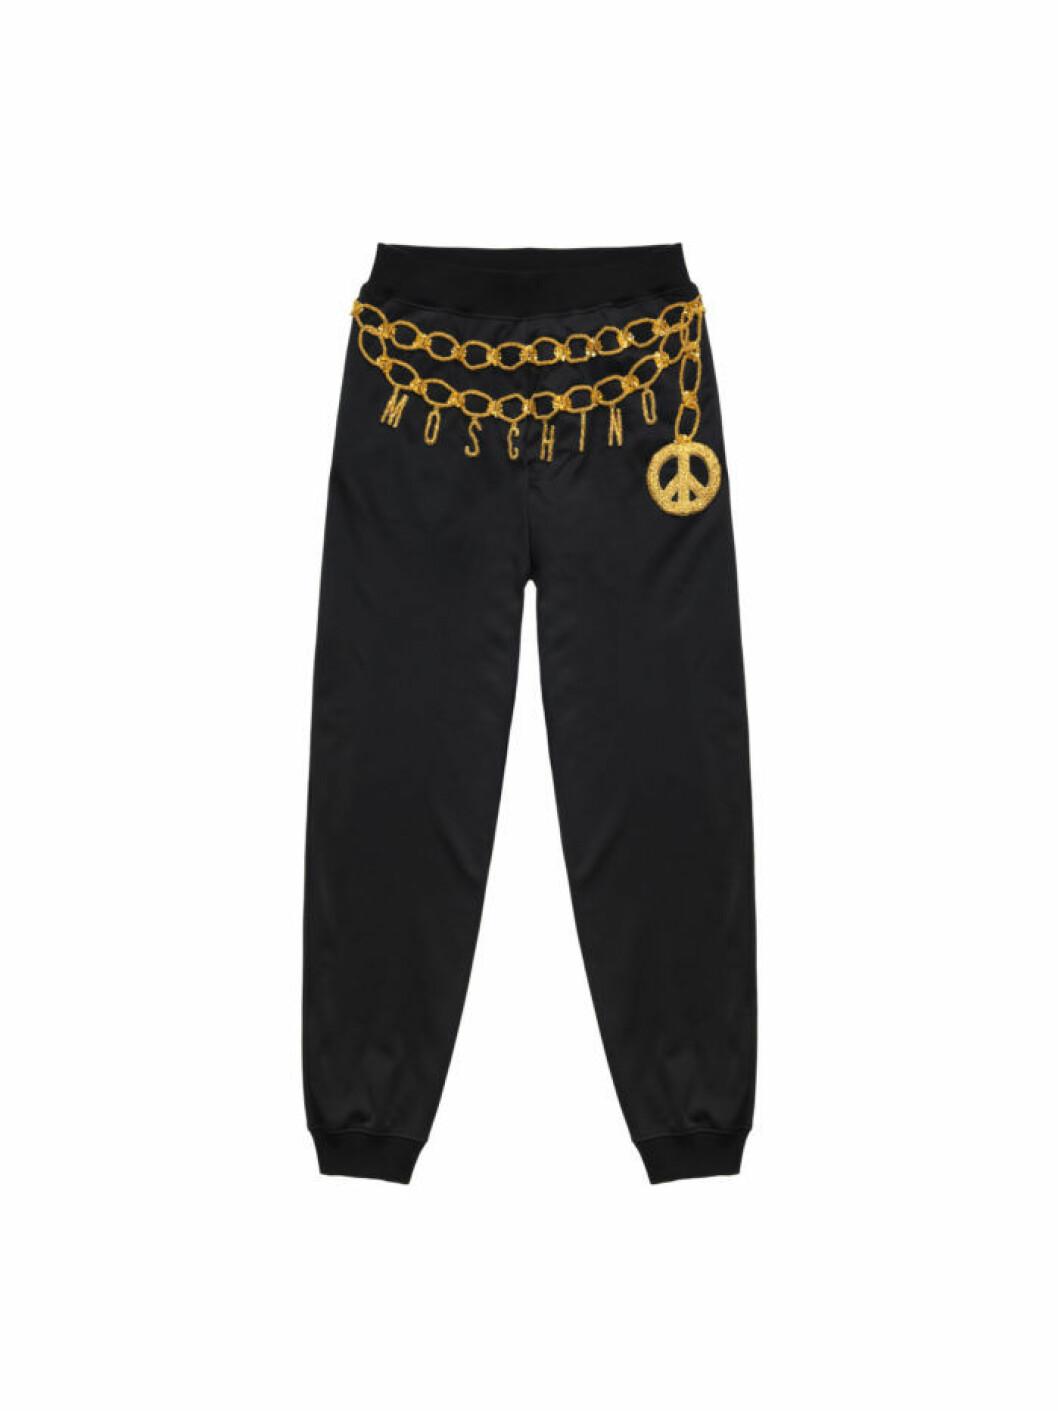 Svarta mjukisbyxor med broderad guldkedjedetalj och Moschinologo ur Moschino [tv] H&M